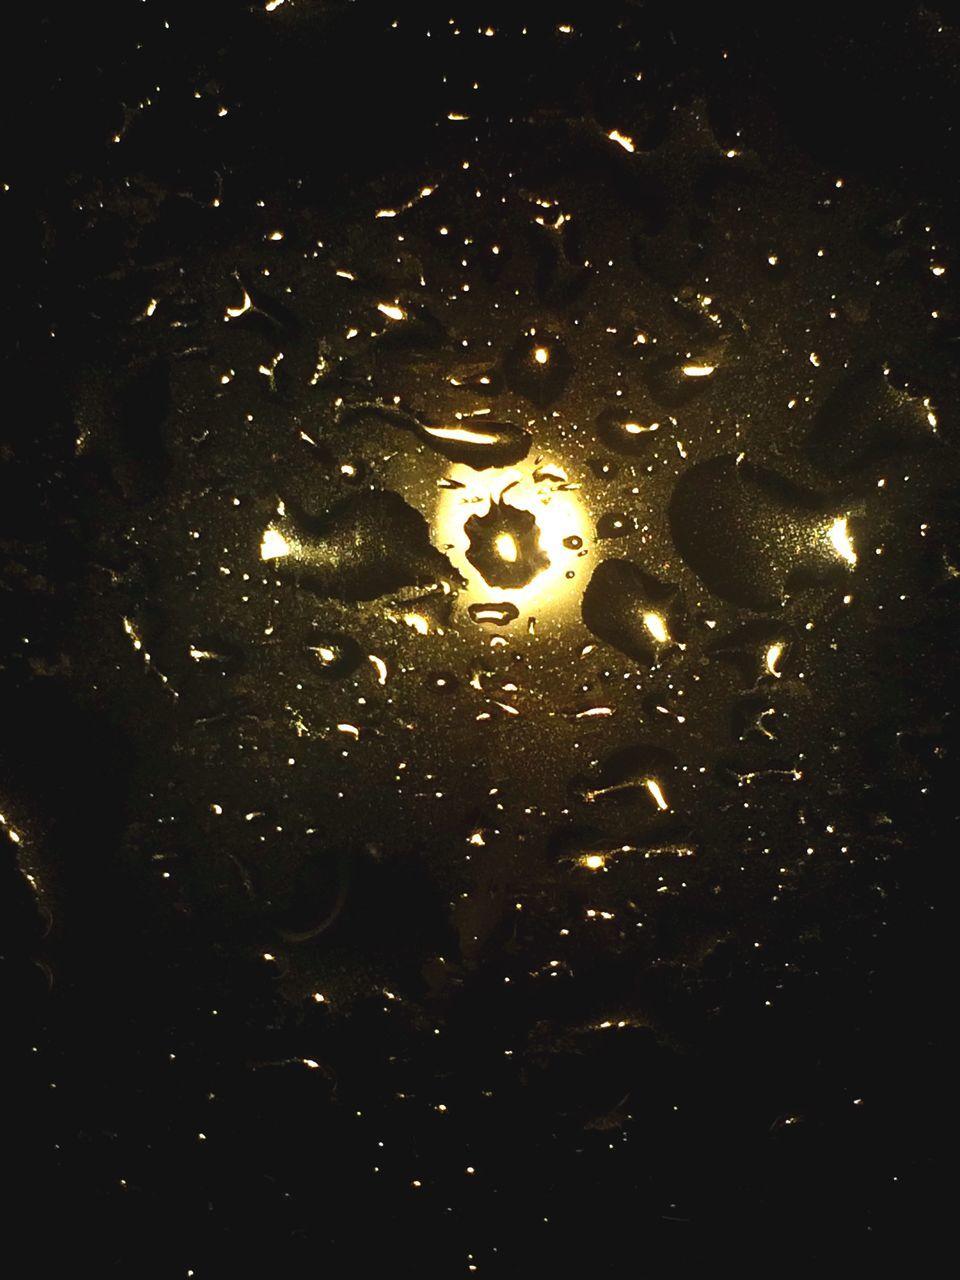 illuminated, night, lighting equipment, no people, celebration, backgrounds, close-up, gold colored, full frame, indoors, diya - oil lamp